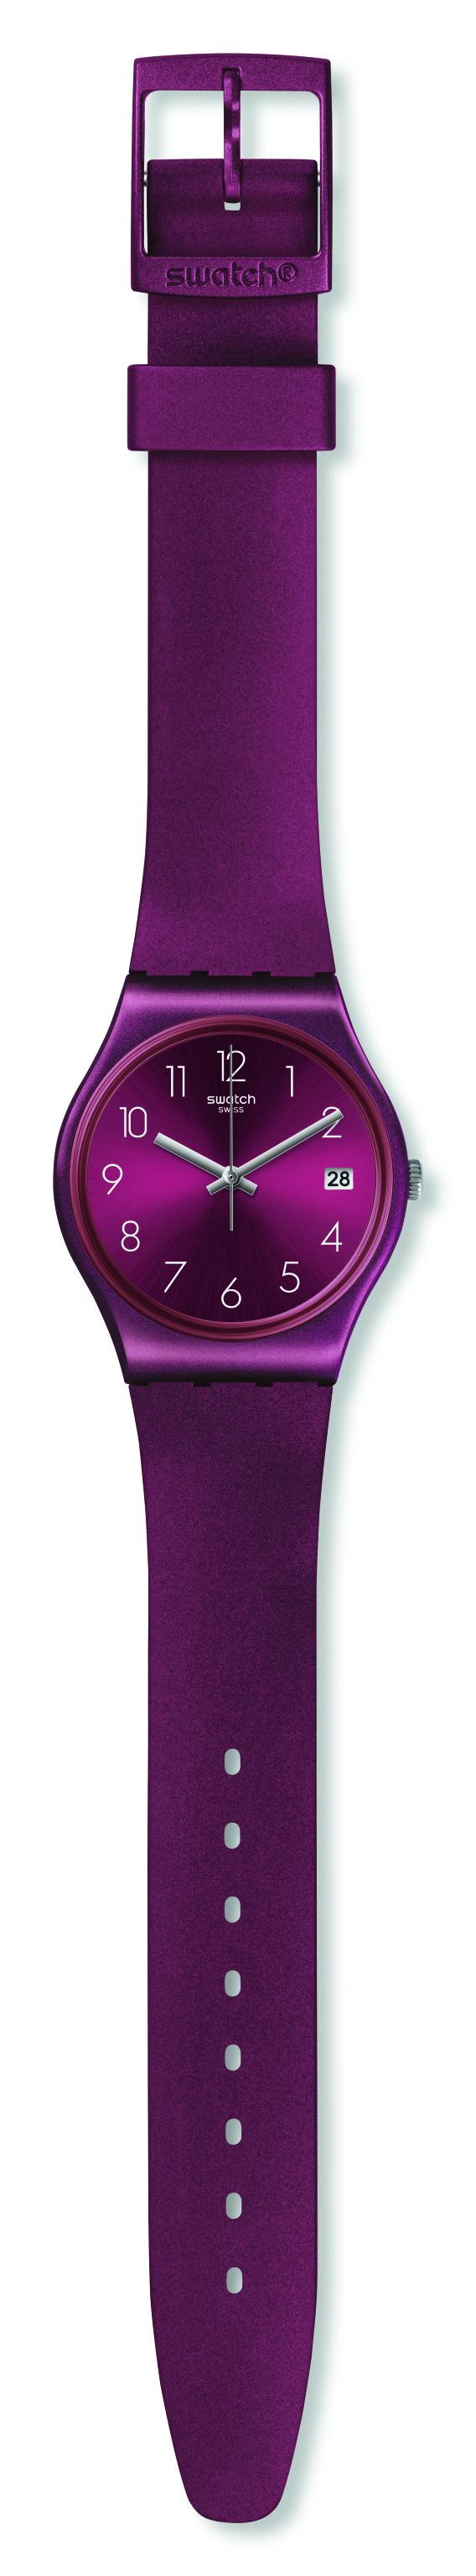 Reloj Reloj Burdeo Reloj Burdeo Swatch Swatch Redbaya Redbaya Redbaya Burdeo H9eEIDW2Y